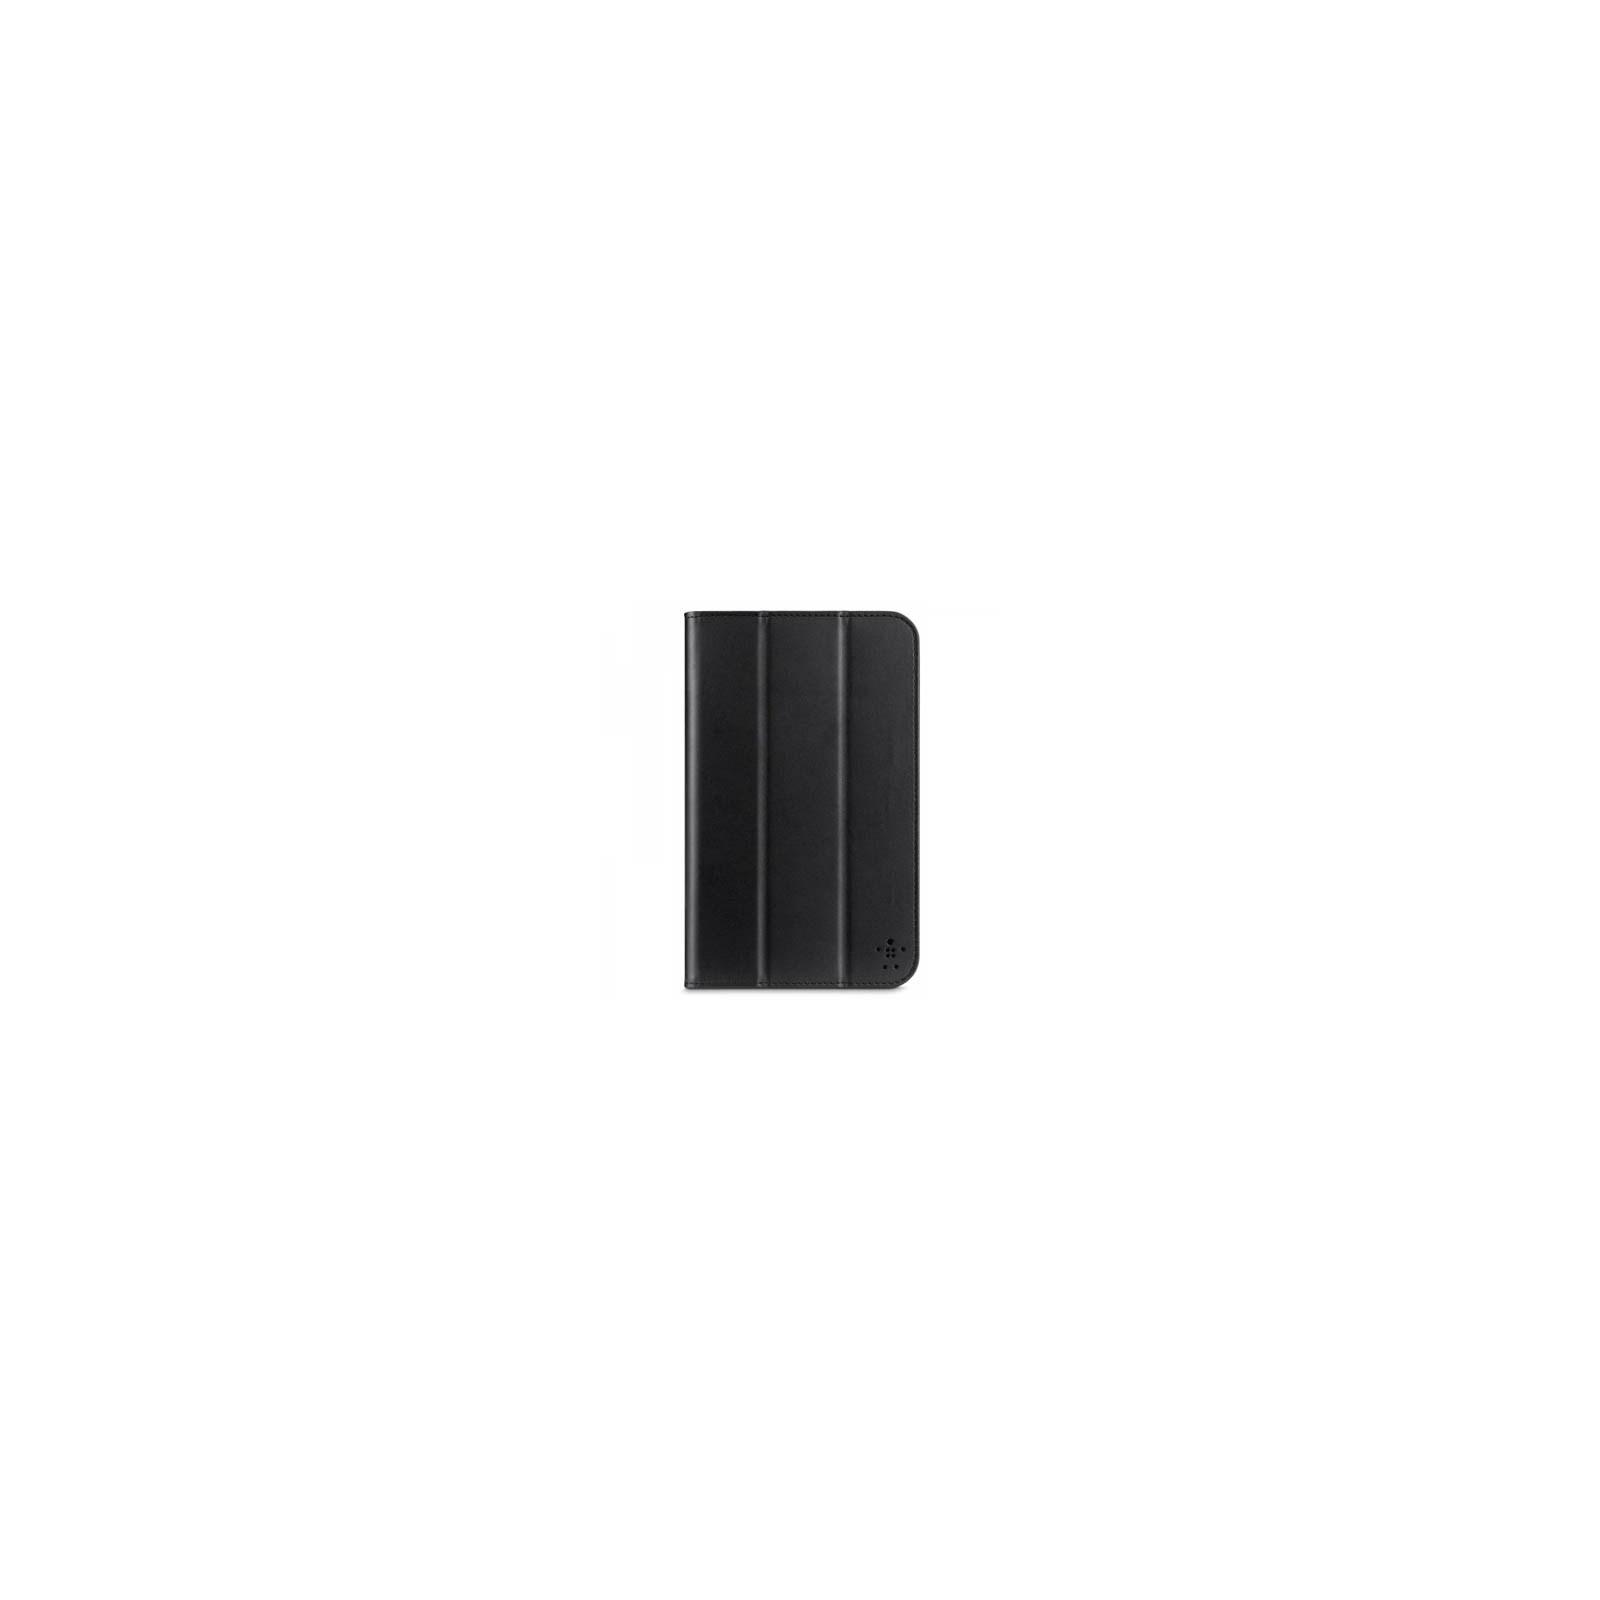 Чехол для планшета Belkin 7 GalaxyTab3 Tri-Fold Cover Stand (F7P120vfC00)